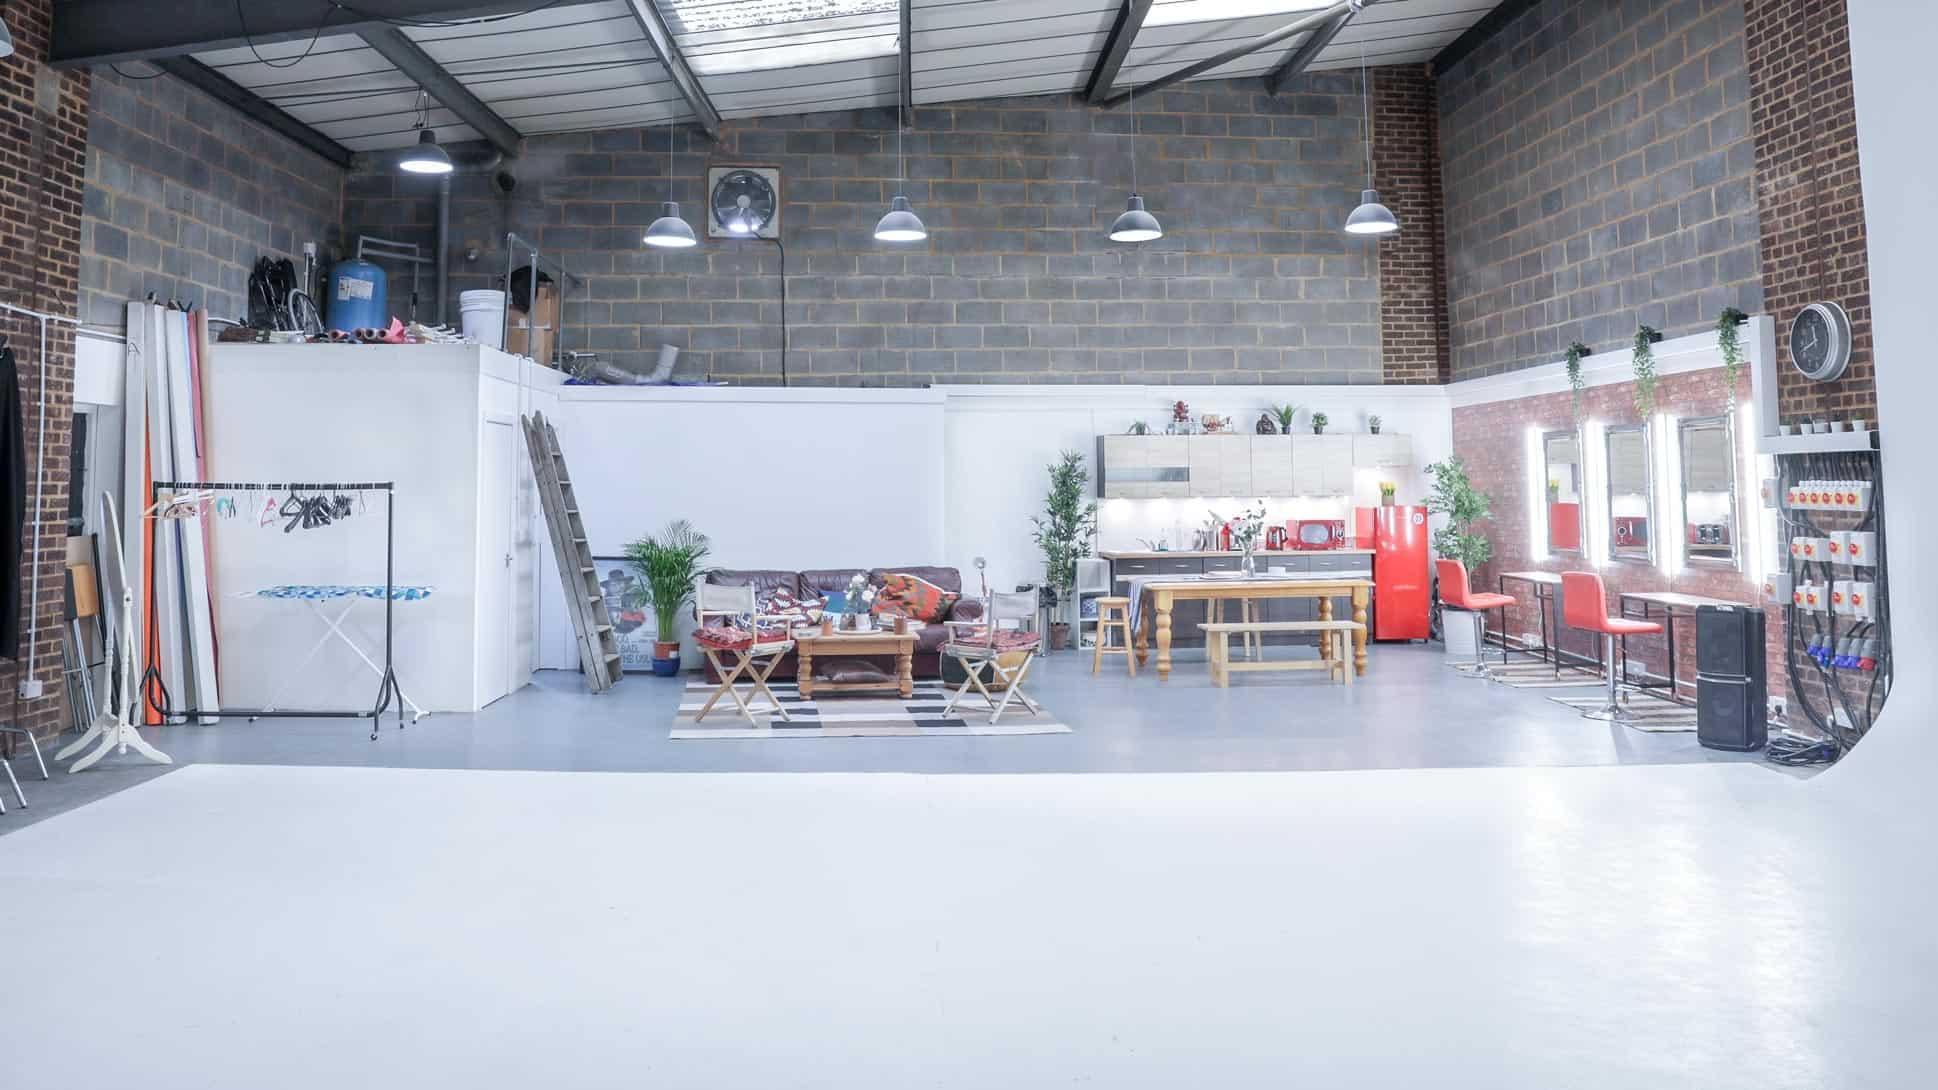 film-studio-hire-london-make-up-area-and-kitchen